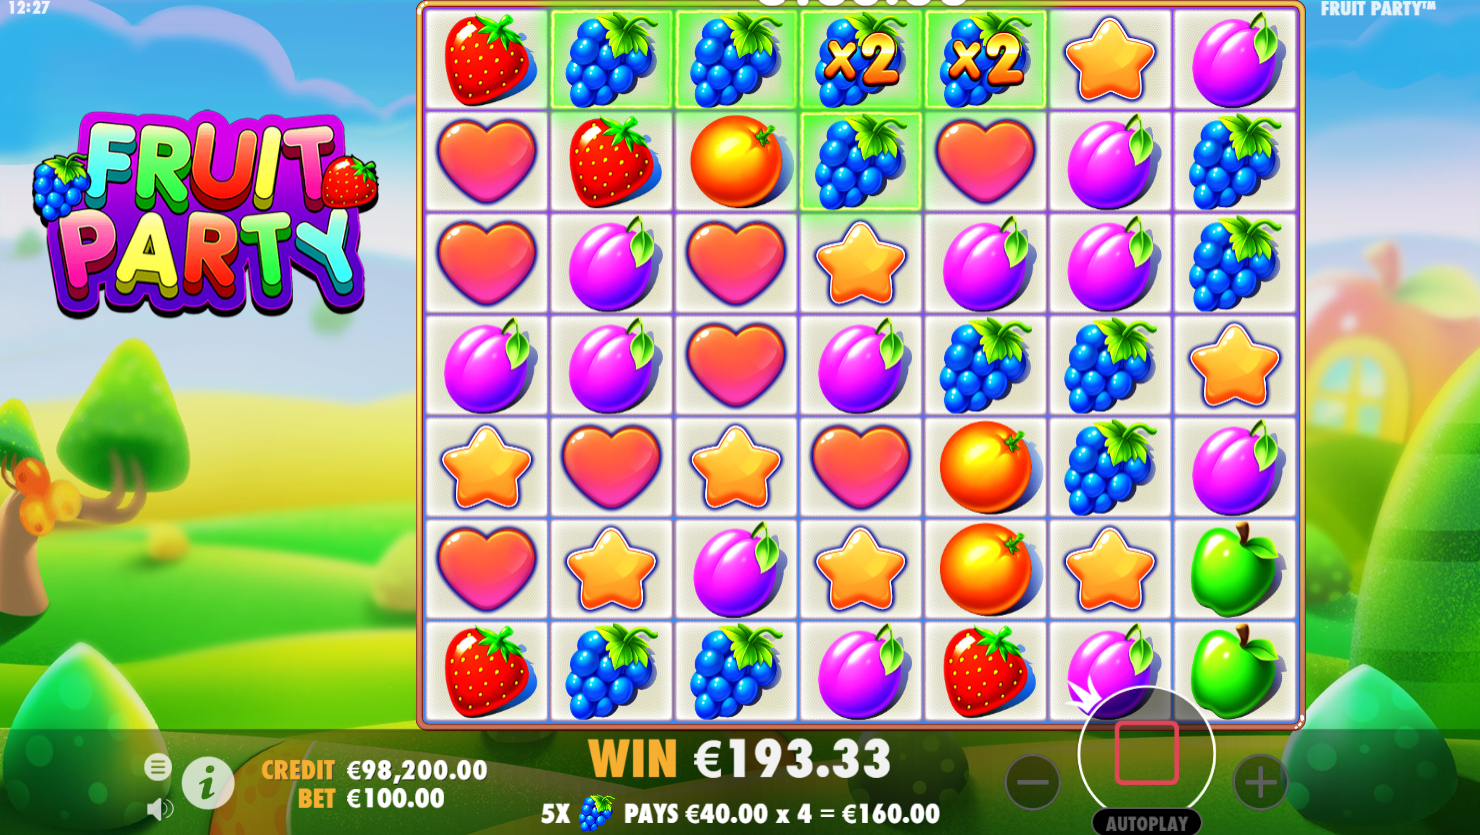 Fruit Party Slot Review - Pragmatic Play GamesPragmatic